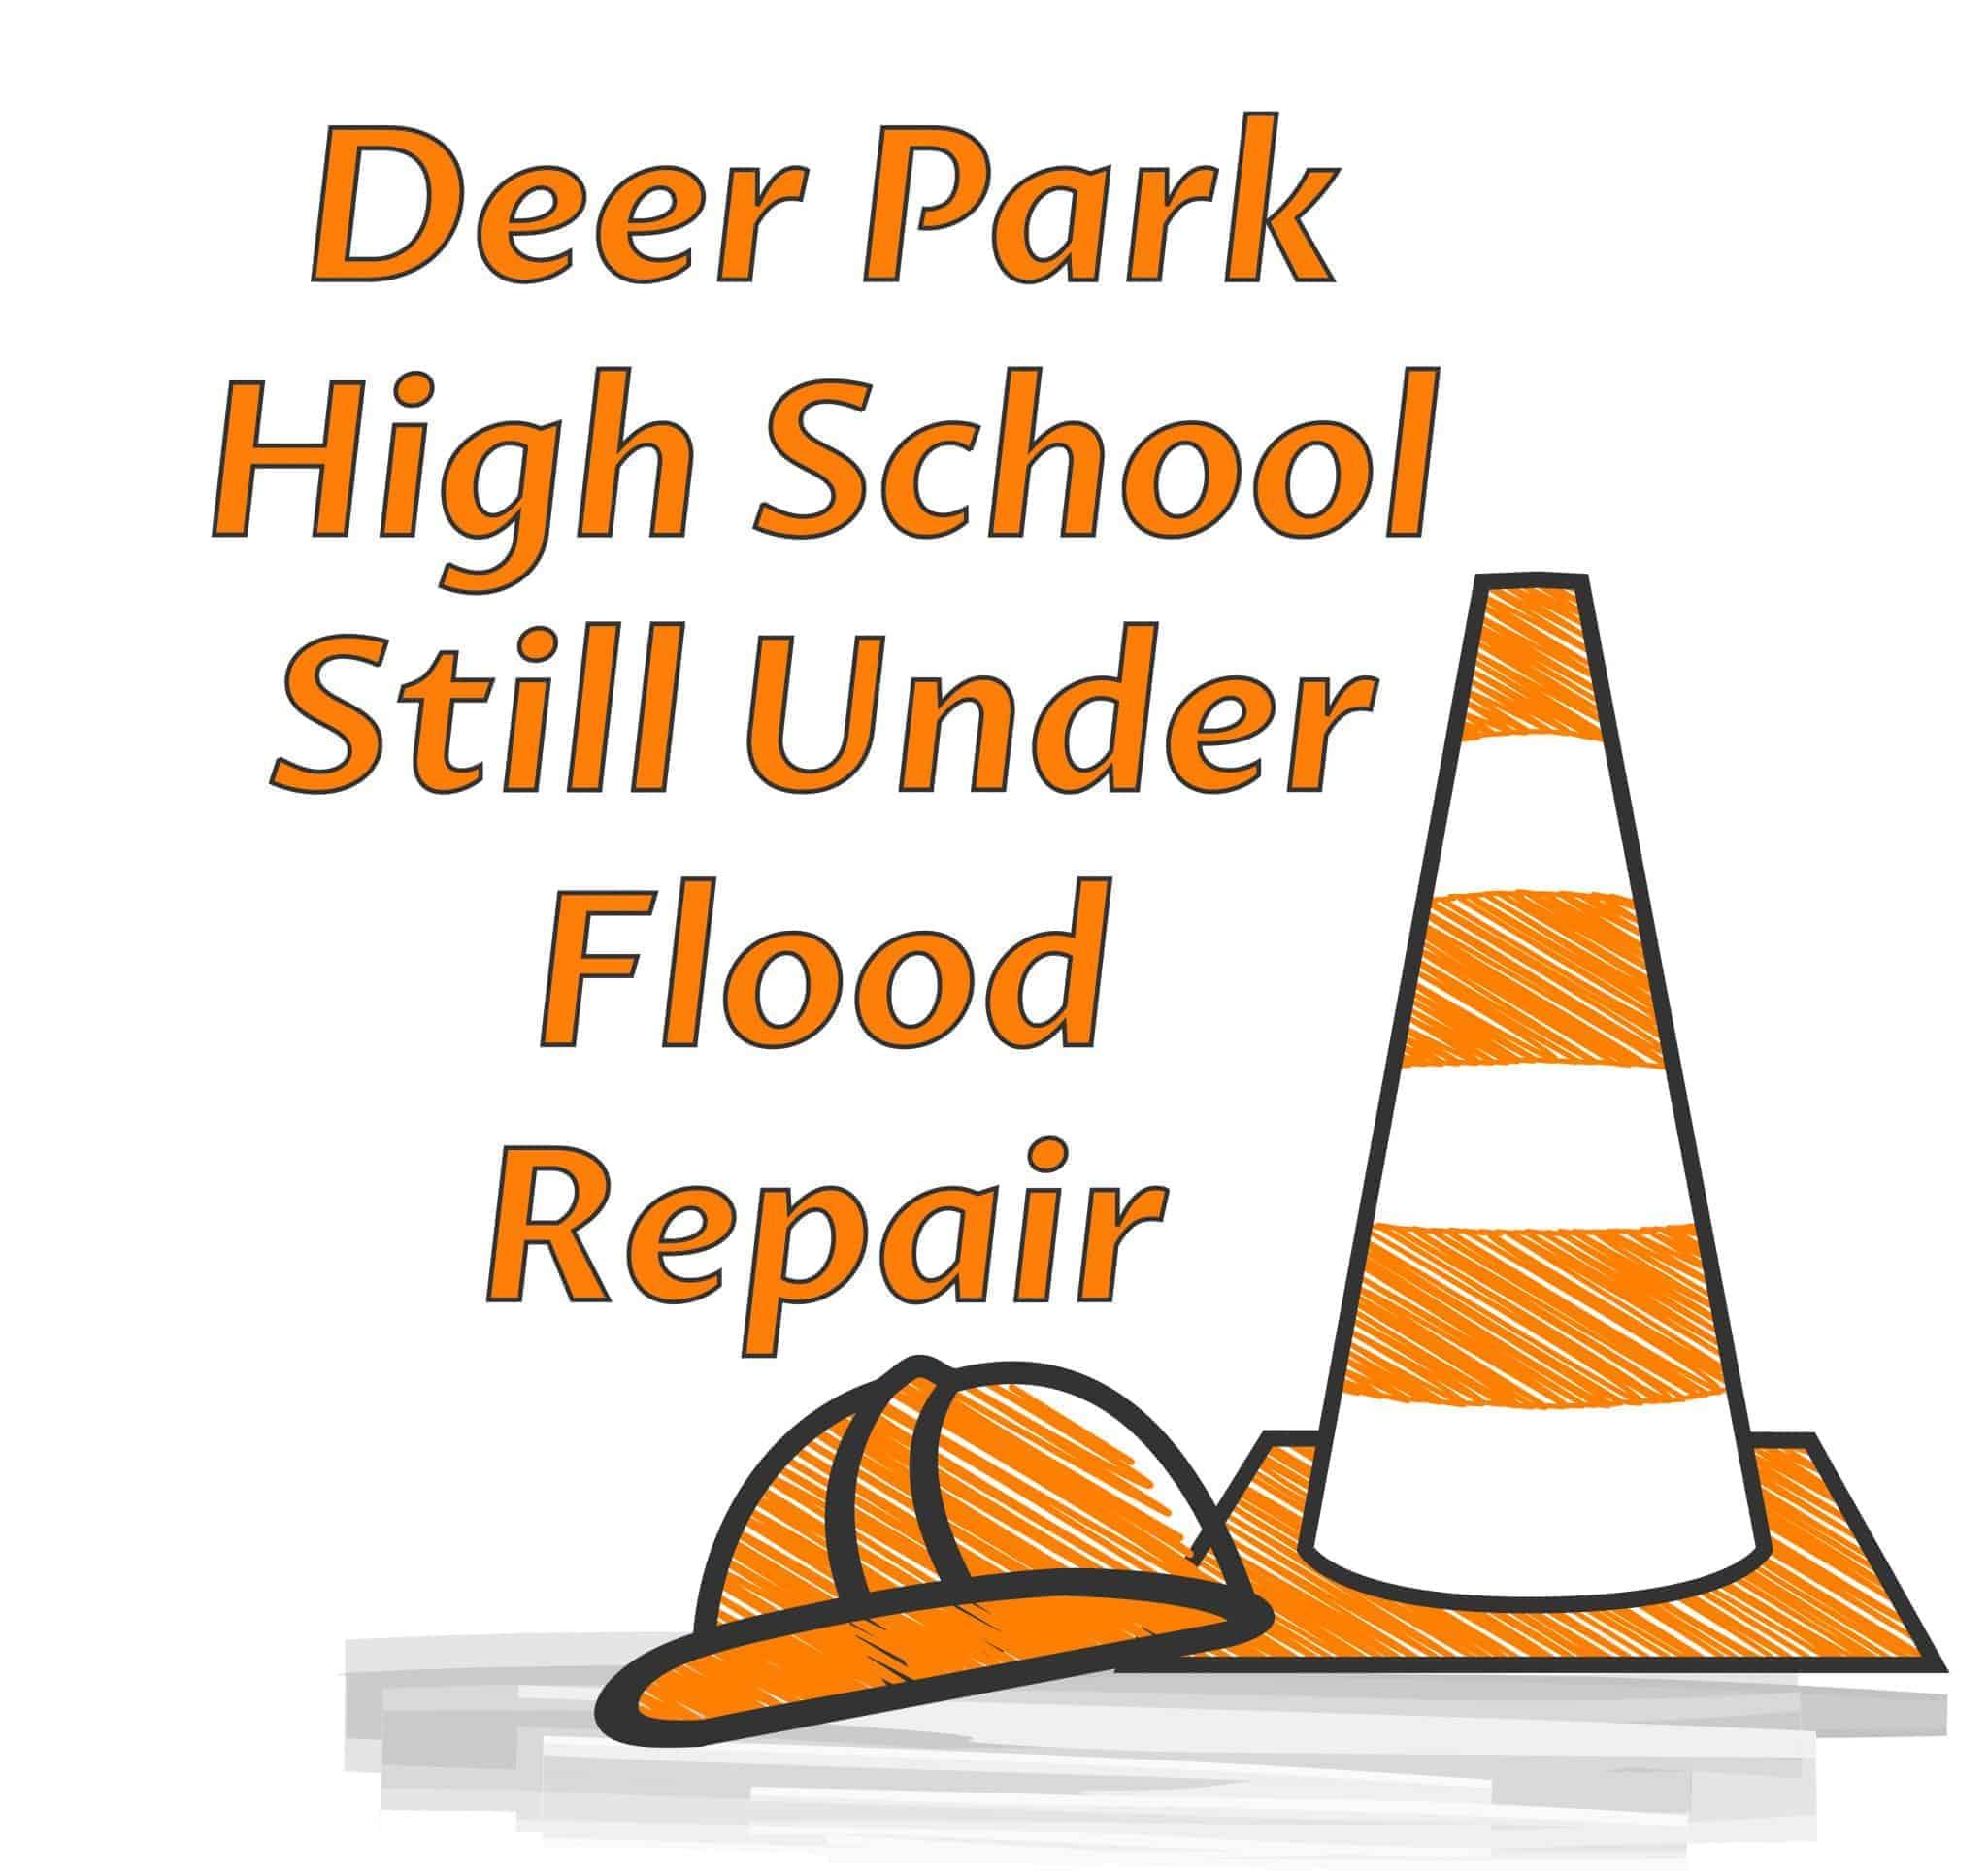 Deer Park High School flood